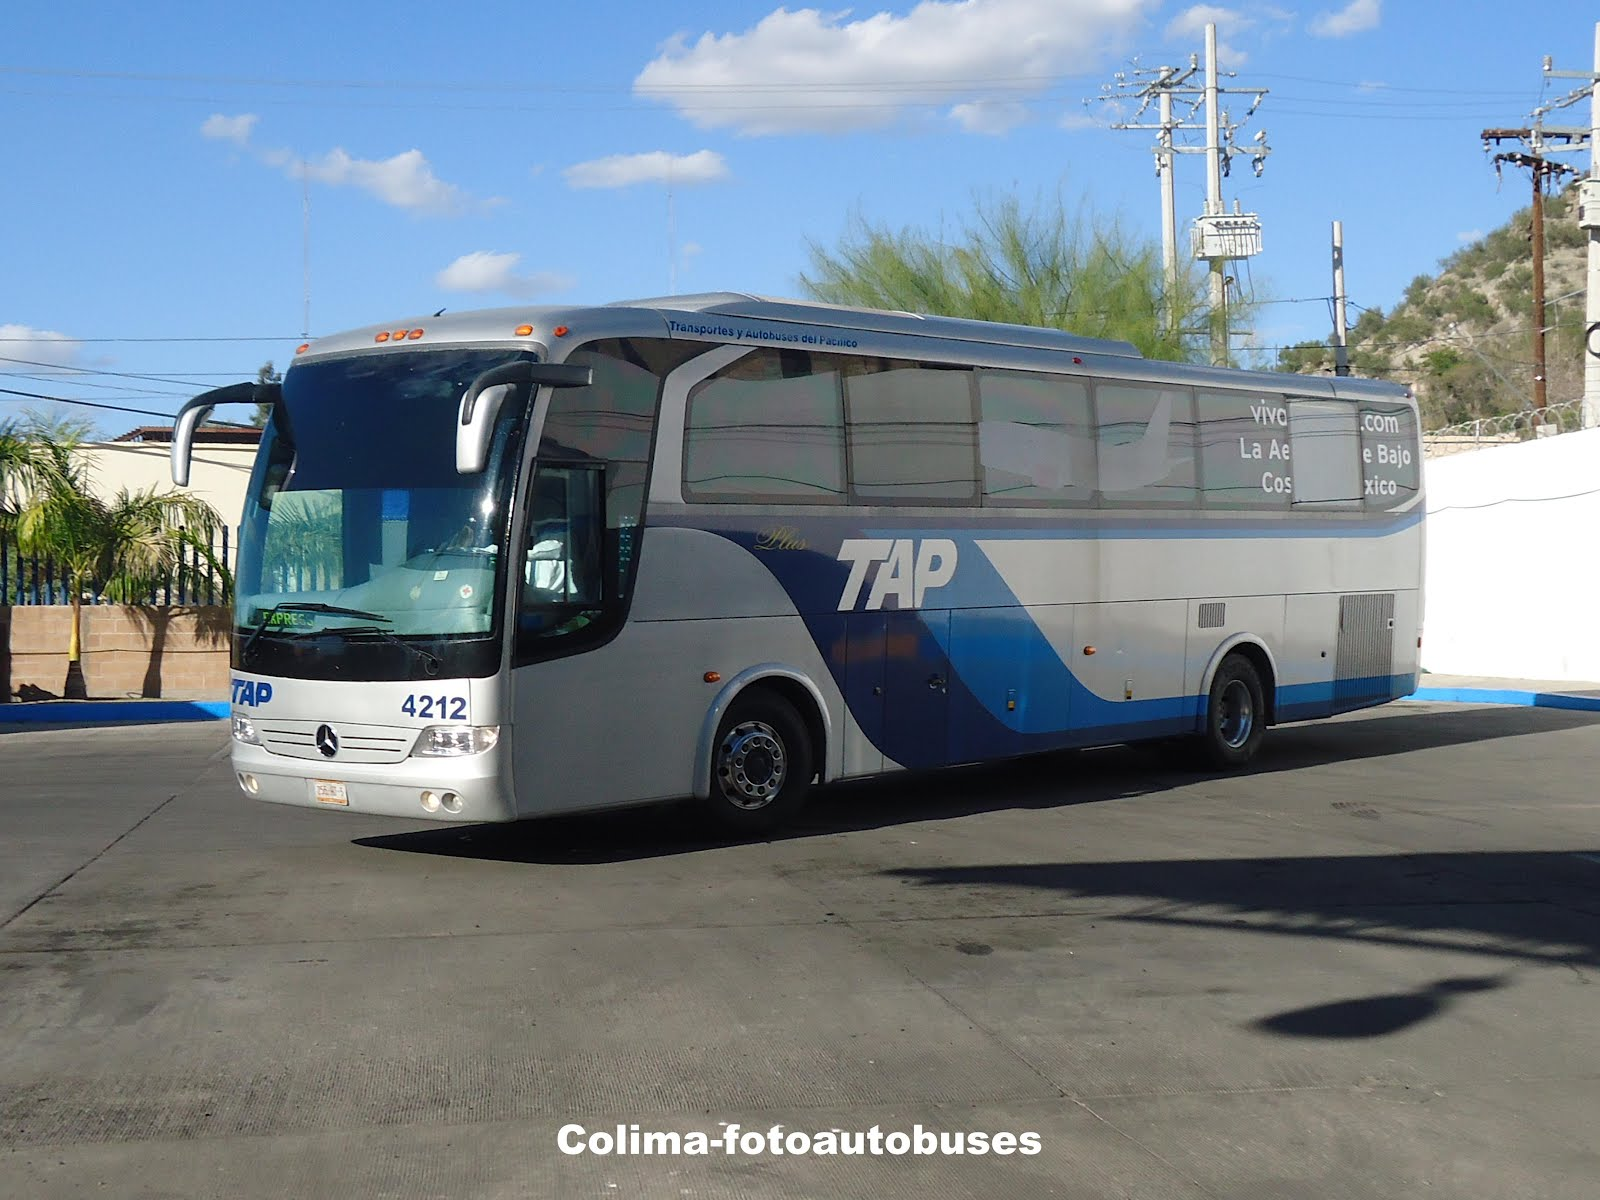 Colima_Fotoautobuses (se usan cookies en este blog): febrero 2012